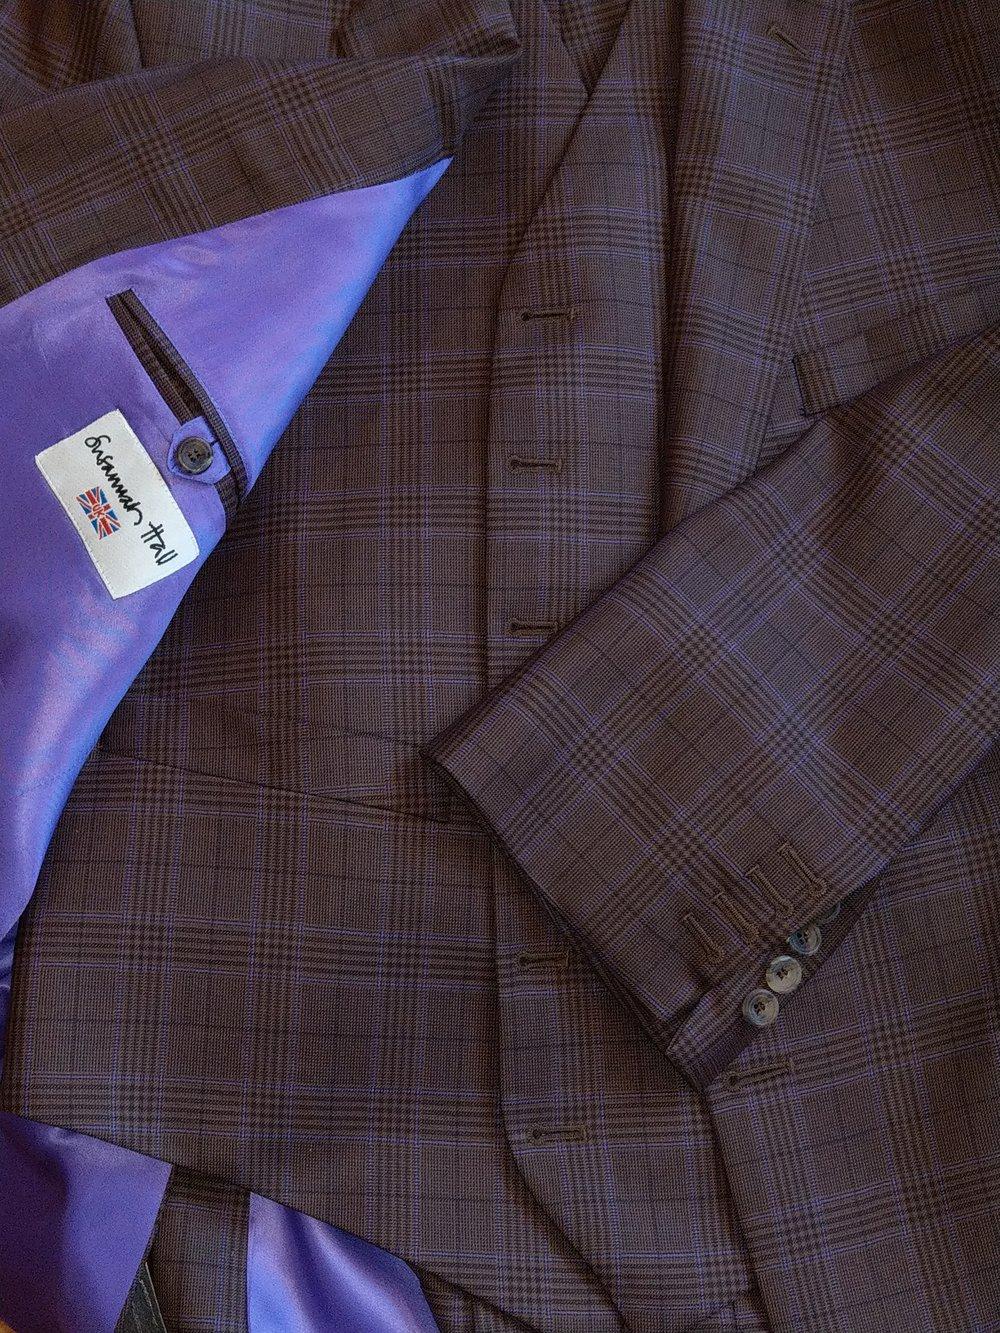 brown-lightweight-tweed-suit-bespoke-susannah-hall-bateman-ogden-made-uk-british.jpg